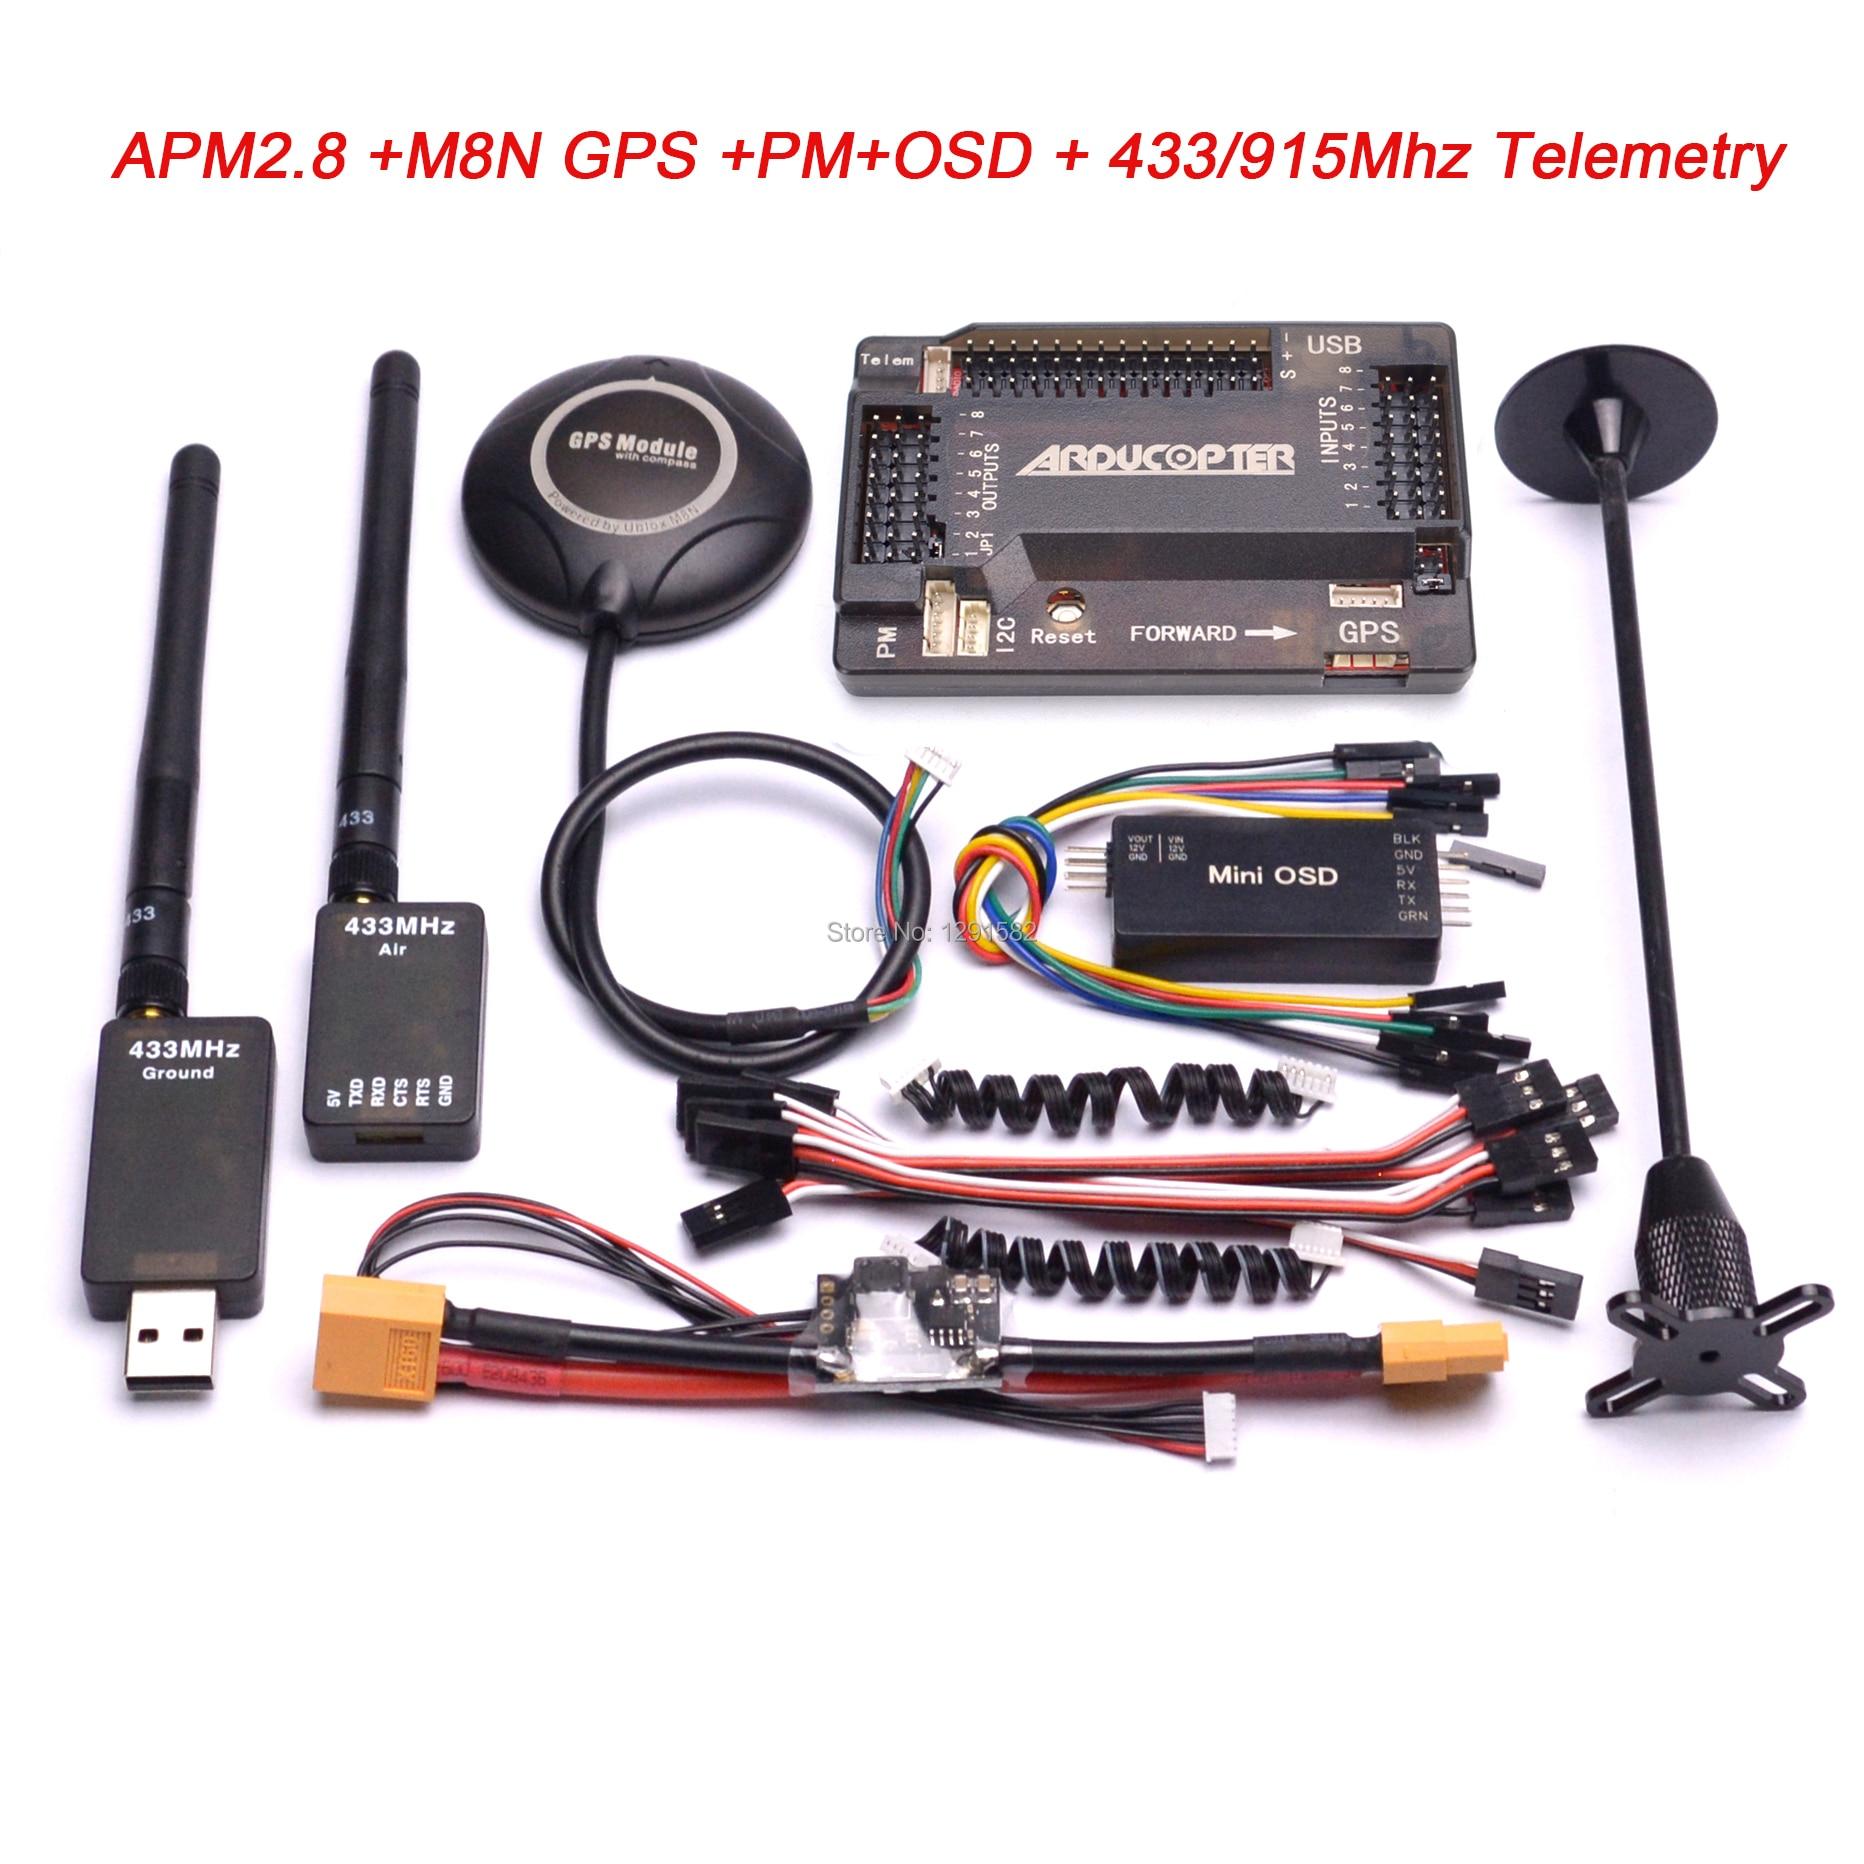 APM2.8 APM 2.8 Flight Controller M8N 8N GPS Compass + Power Moudle + Mini OSD + 915Mhz / 433Mhz 100mw / 500mw Telemetry Kit